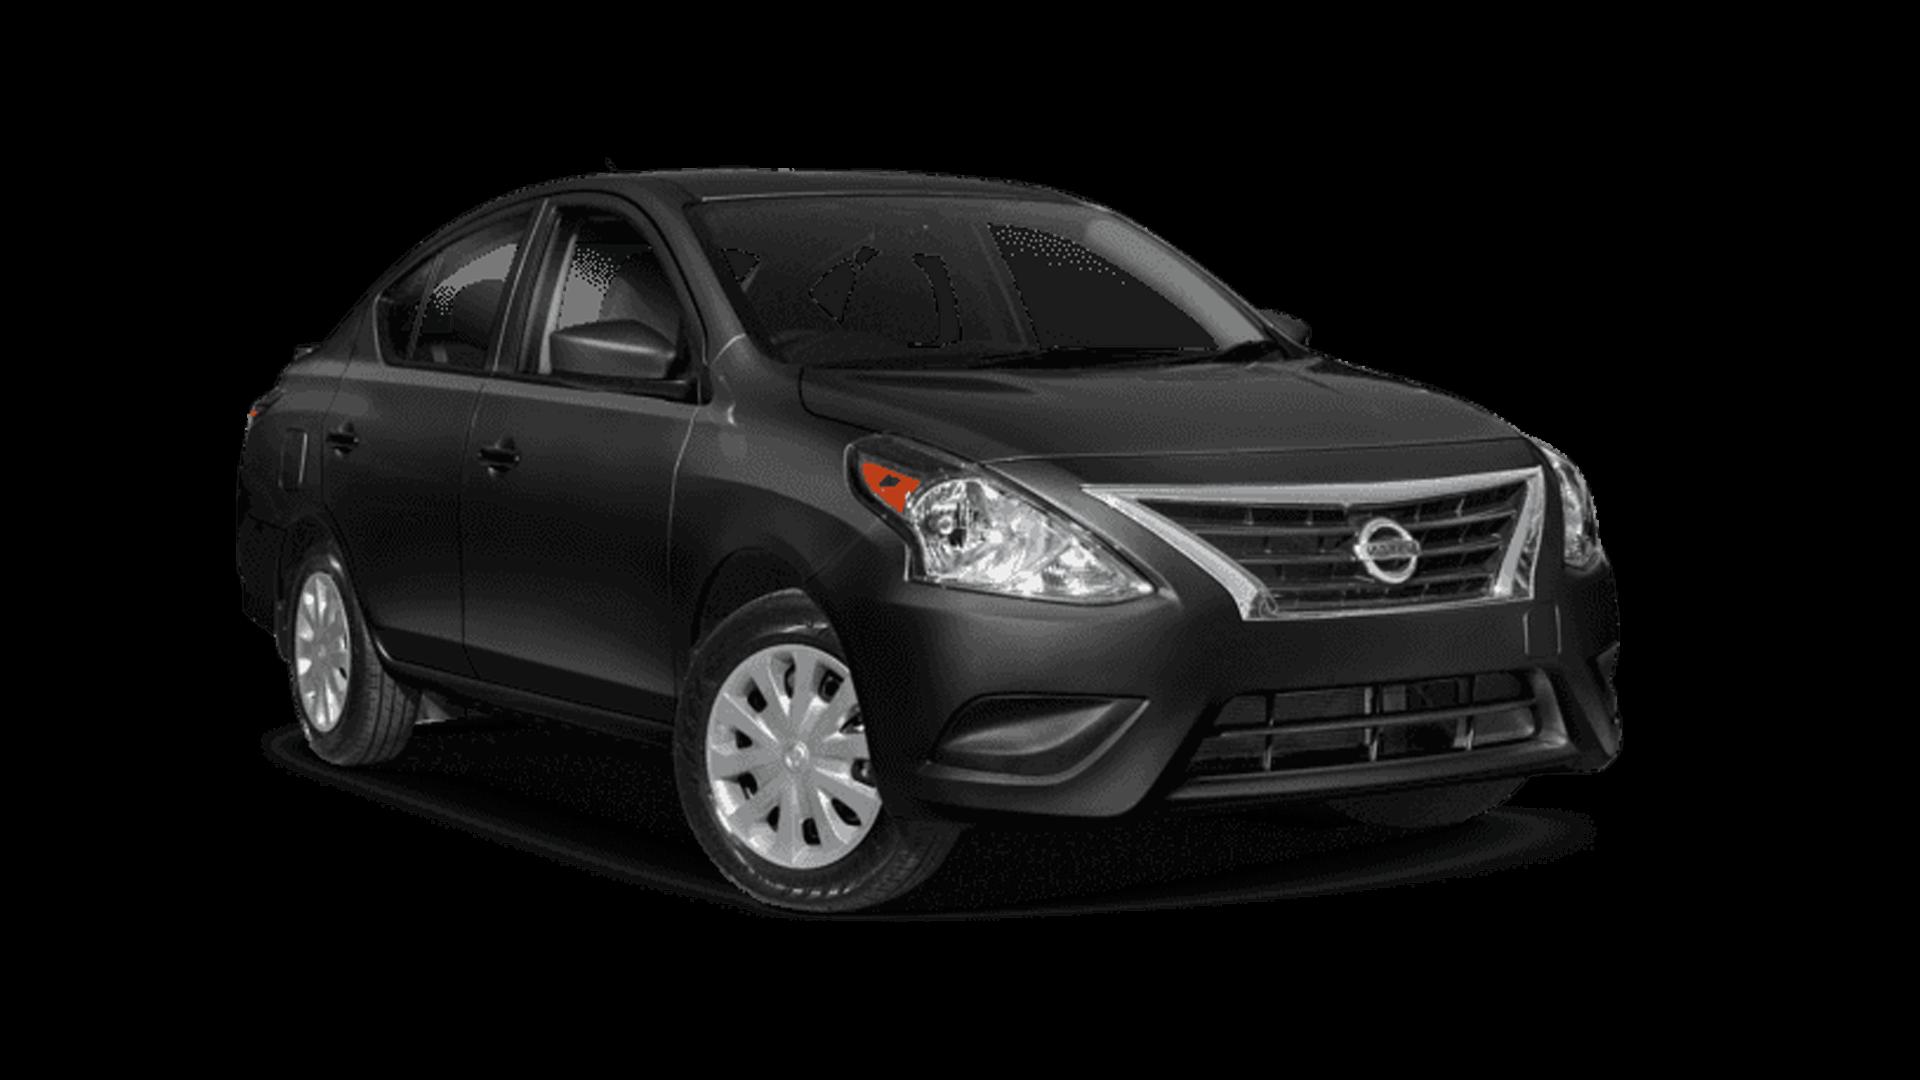 ekar - Nissan Sunny